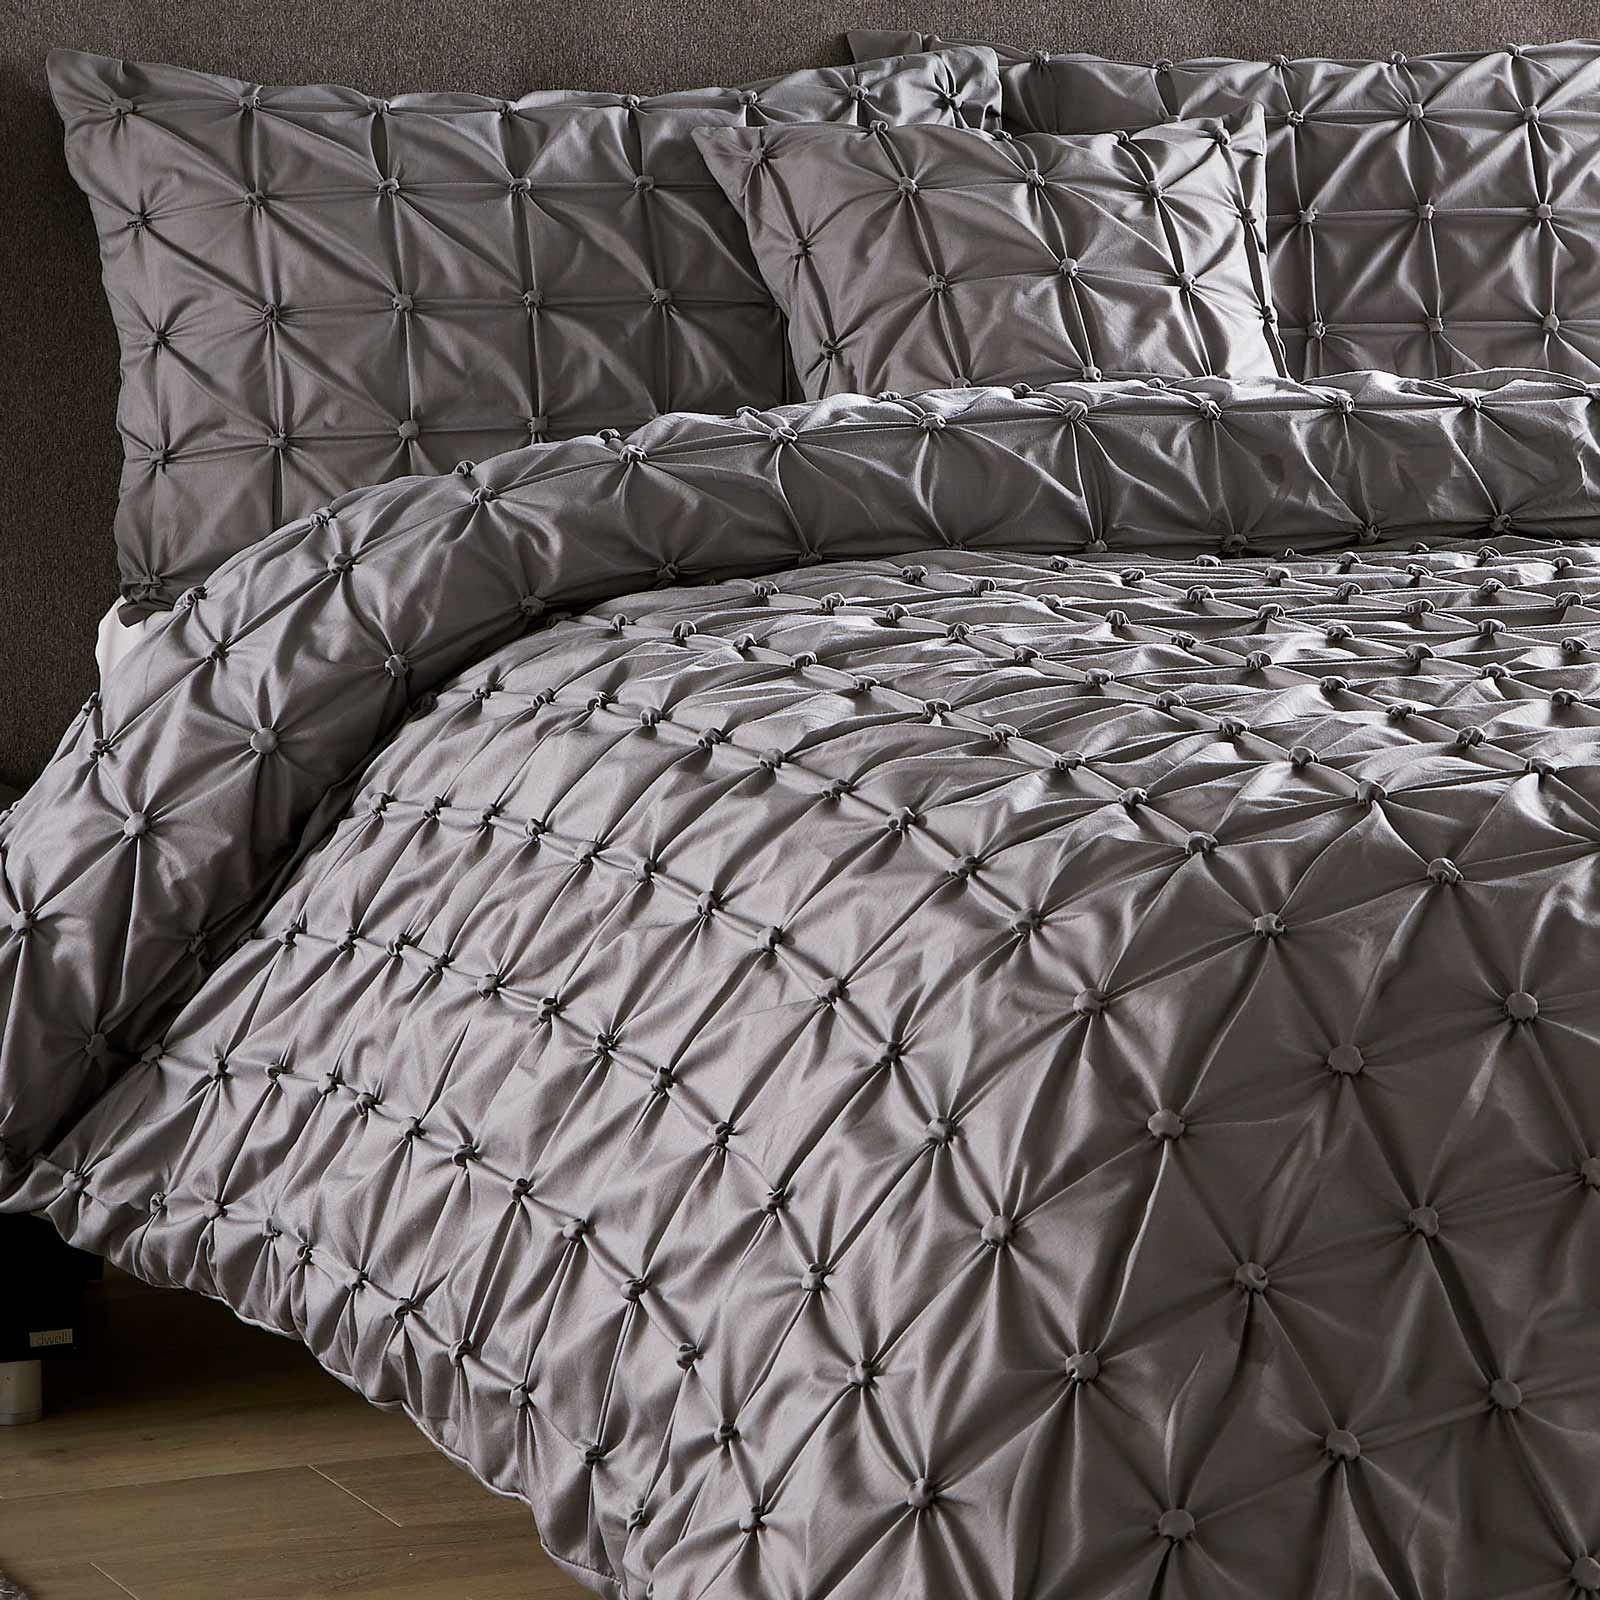 Pleated-Duvet-Covers-Seville-Pintuck-Luxury-Cotton-Rich-Quilt-Bedding-Sets thumbnail 4